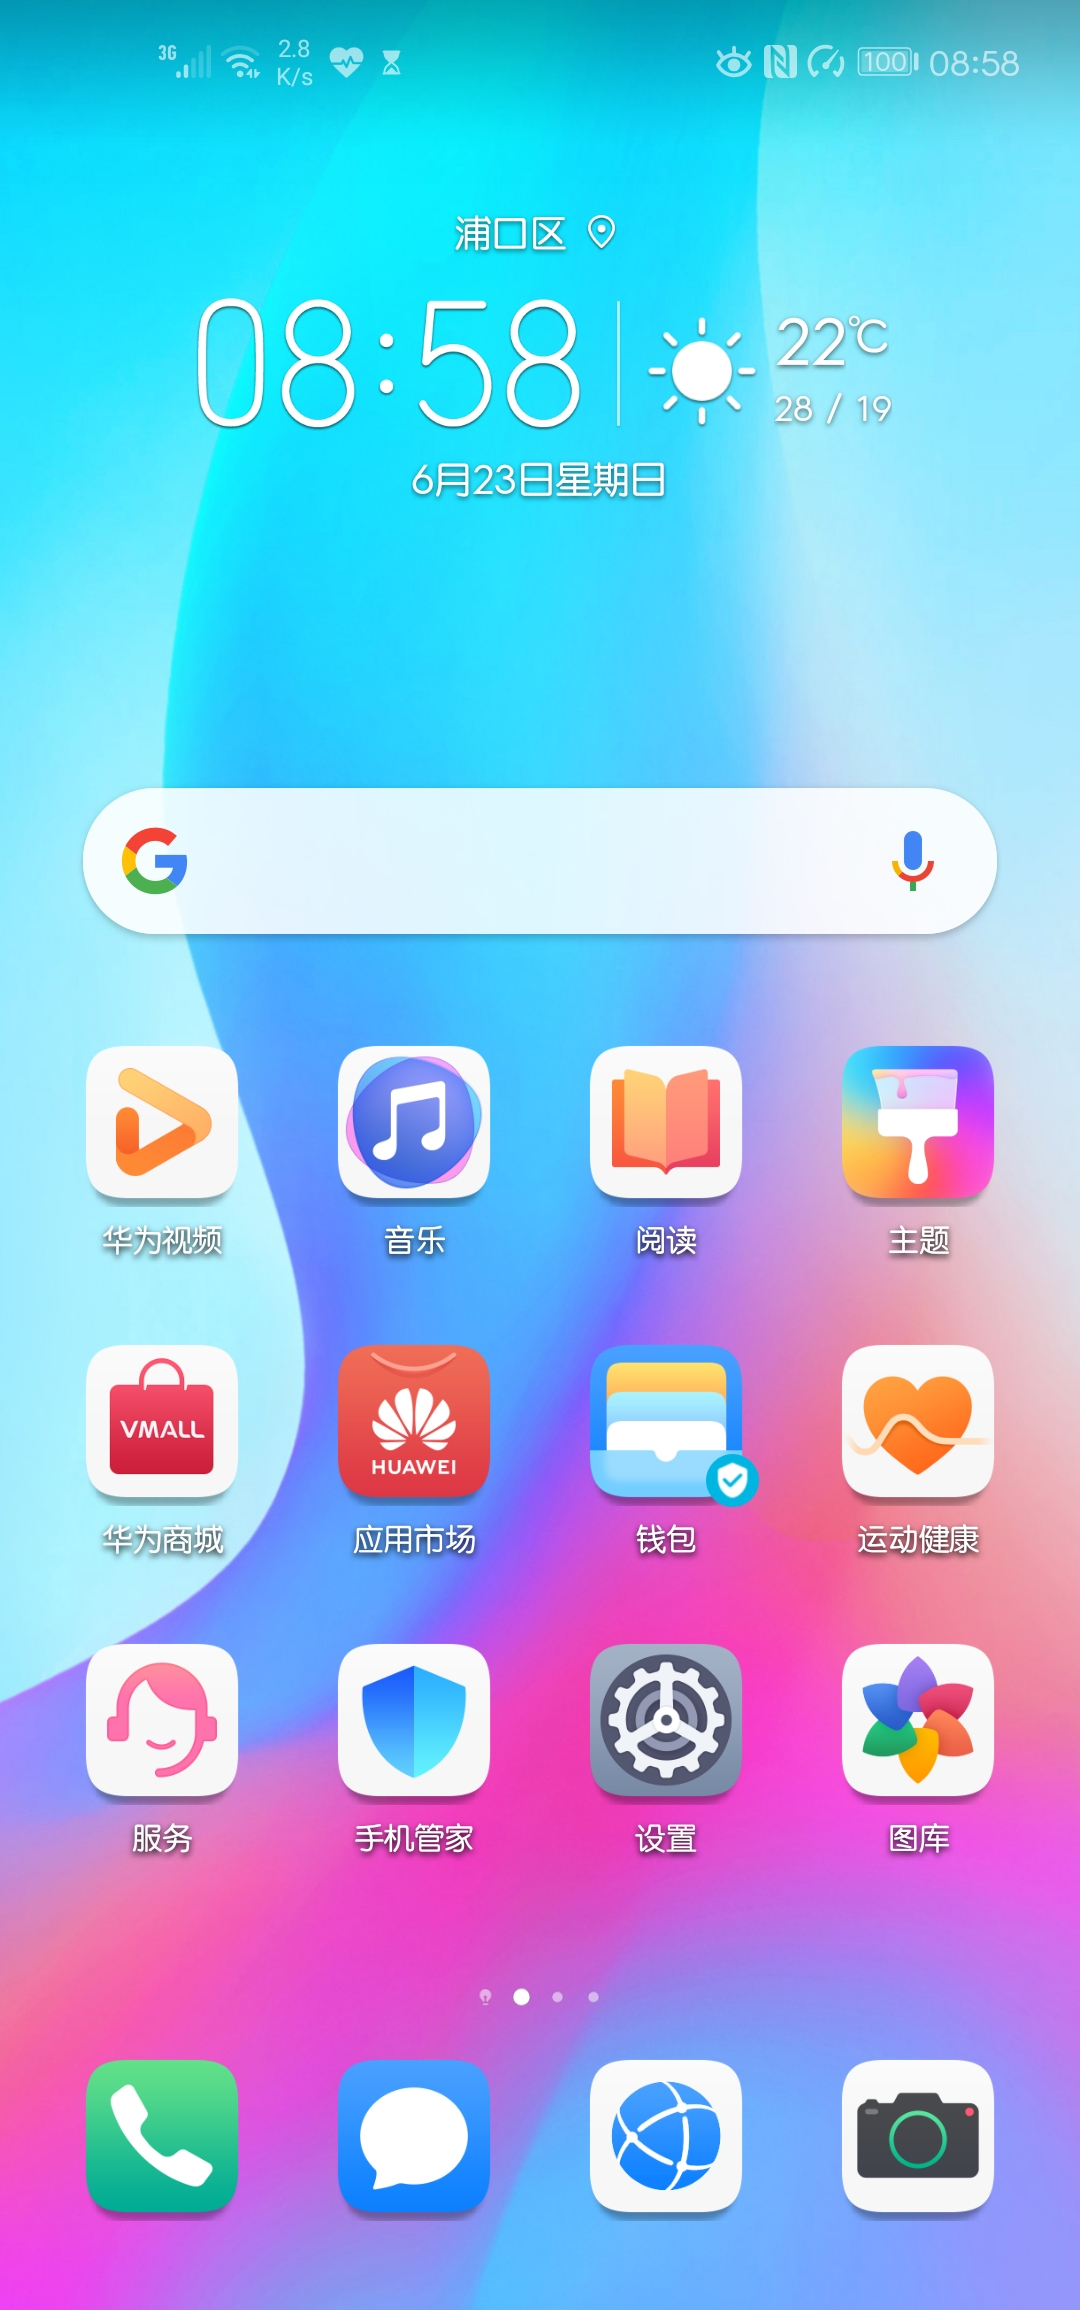 Screenshot_20190623_085858_com.huawei.android.lau.jpg